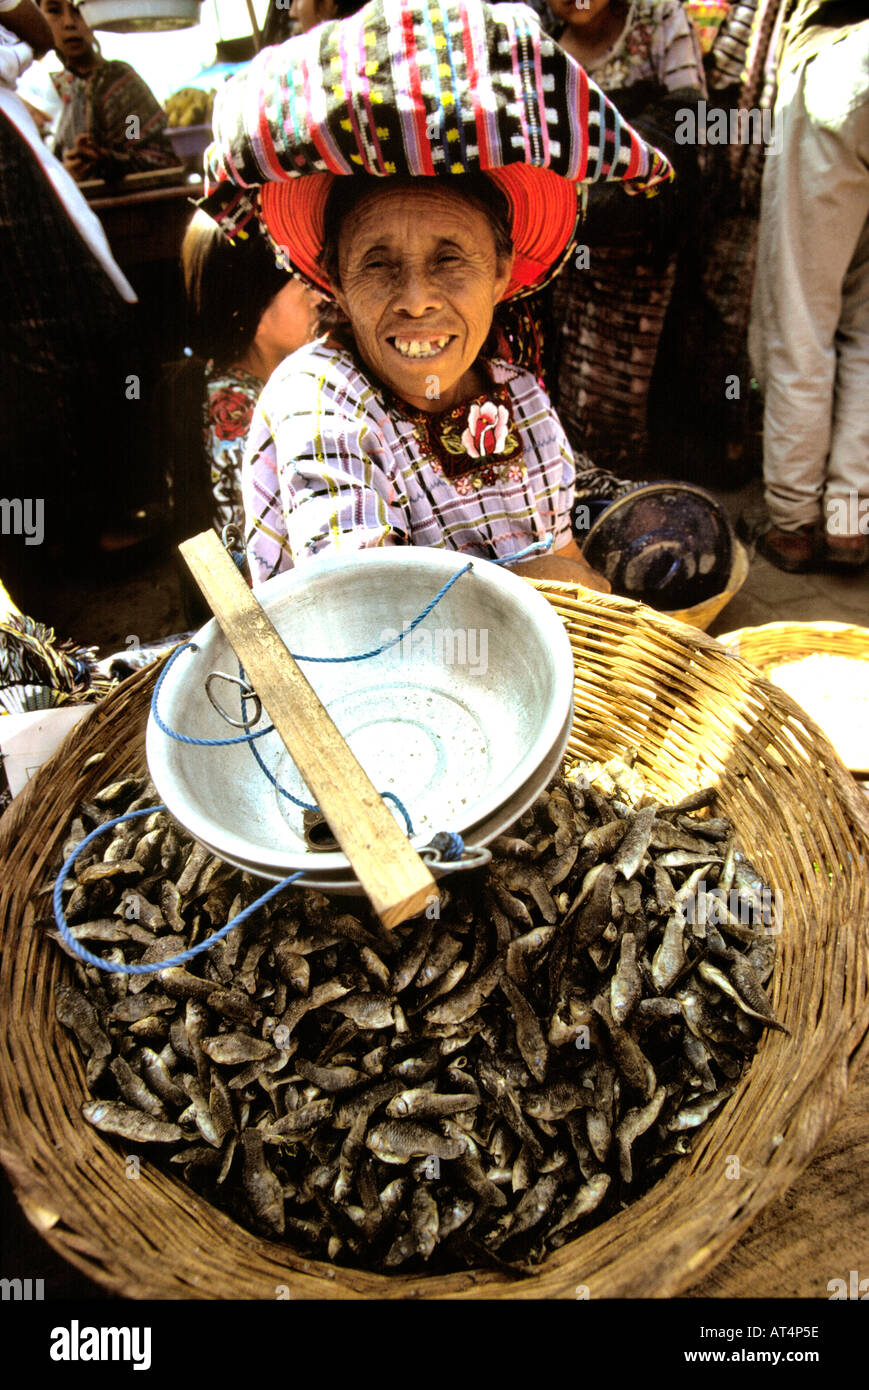 Guatemala Santiago Atitlan old woman in market - Stock Image